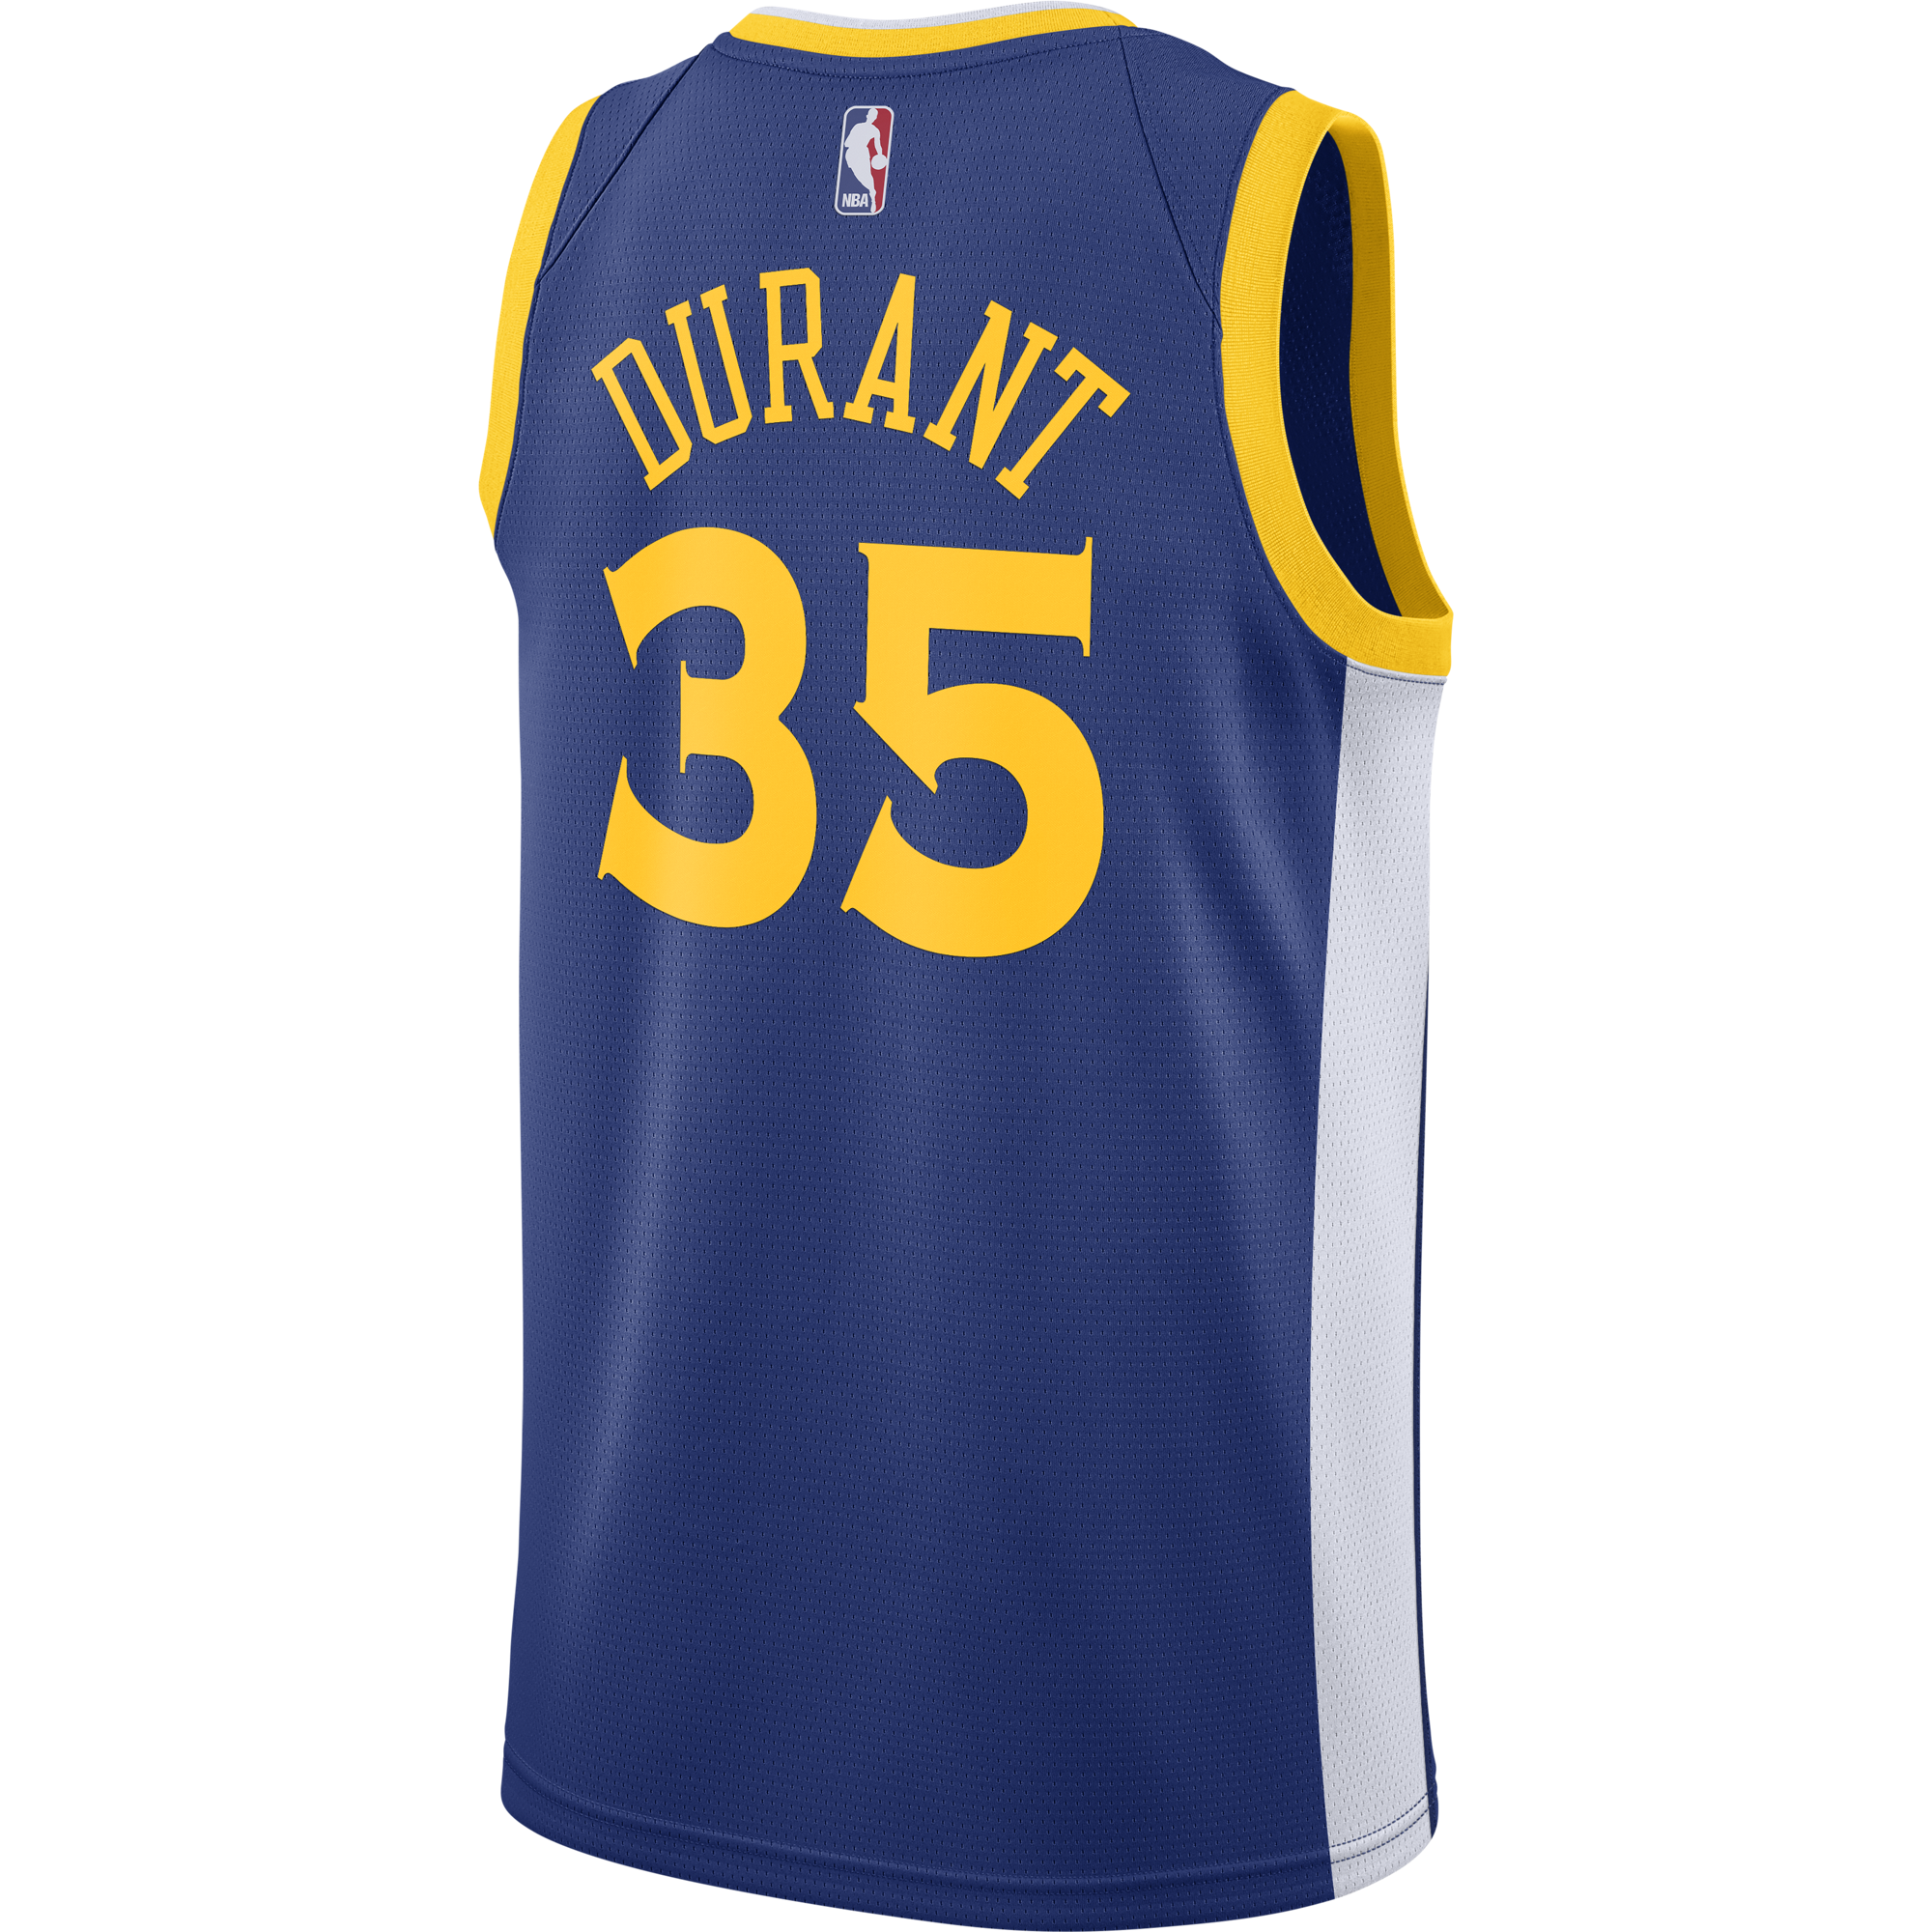 407026cff38 NIKE NBA GOLDEN STATE WARRIORS KEVIN DURANT SWINGMAN JERSEY ROAD. Previous  Next